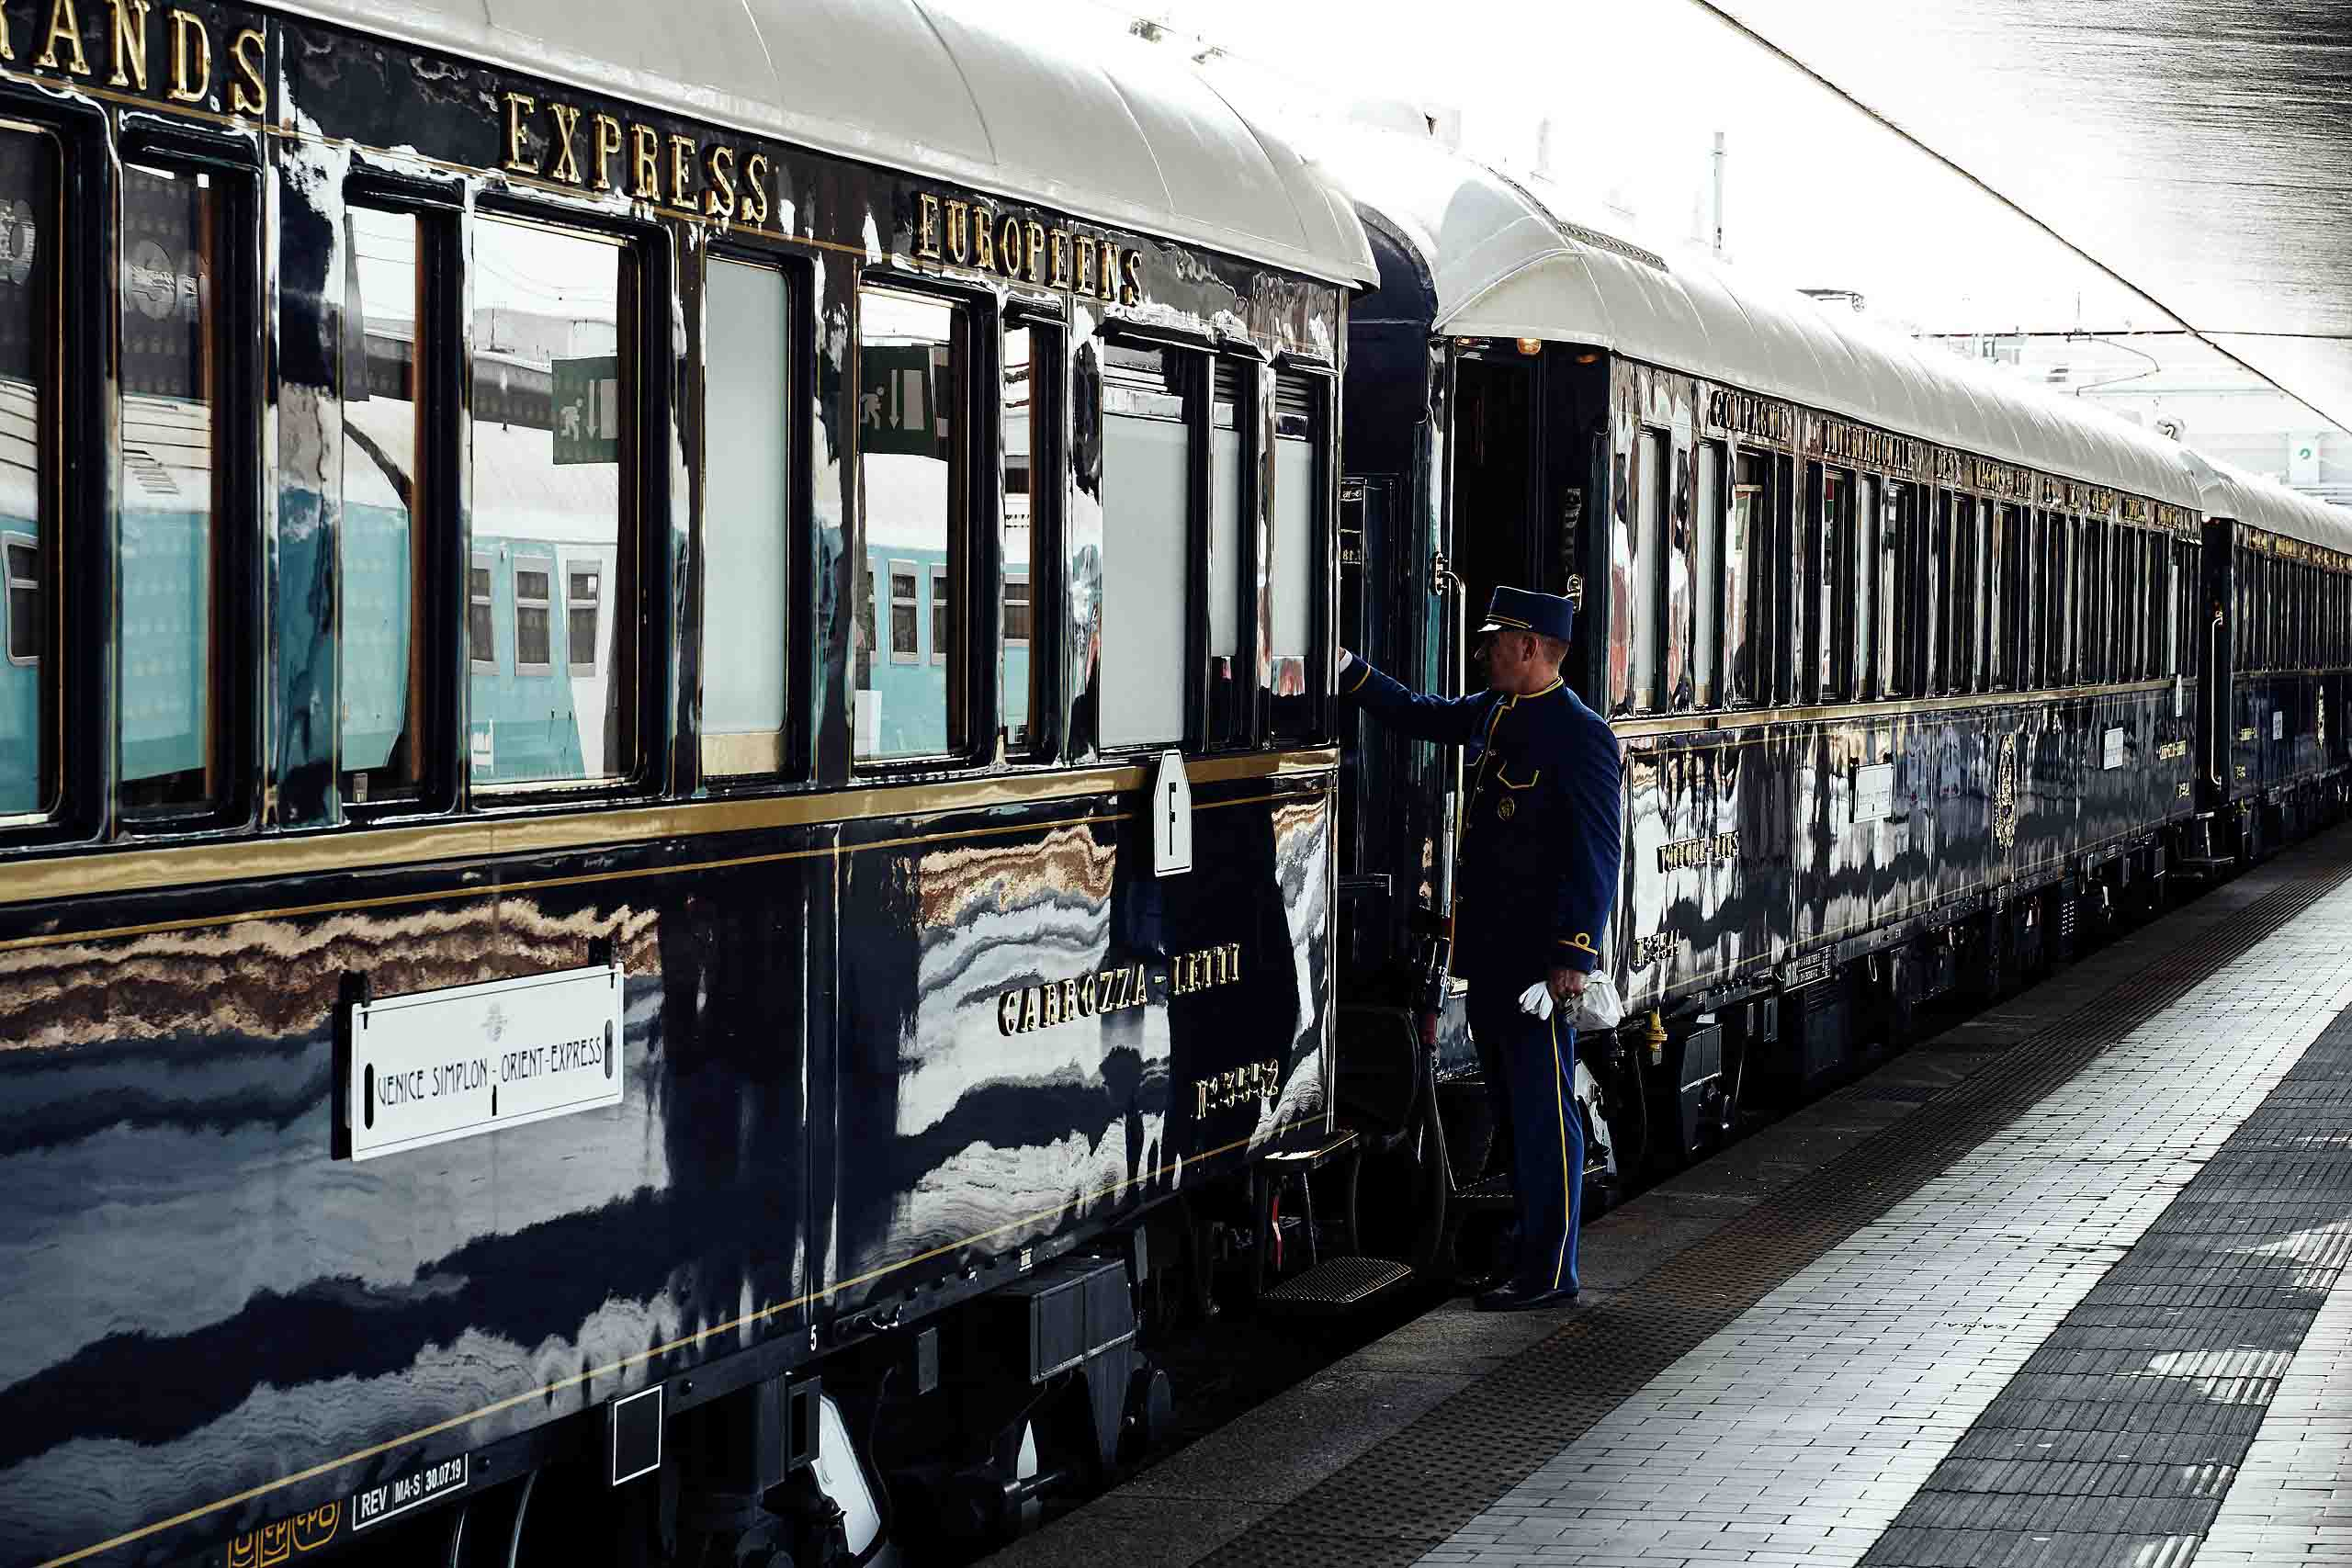 PermaLiv_Venice_Simplon-Orient-Express